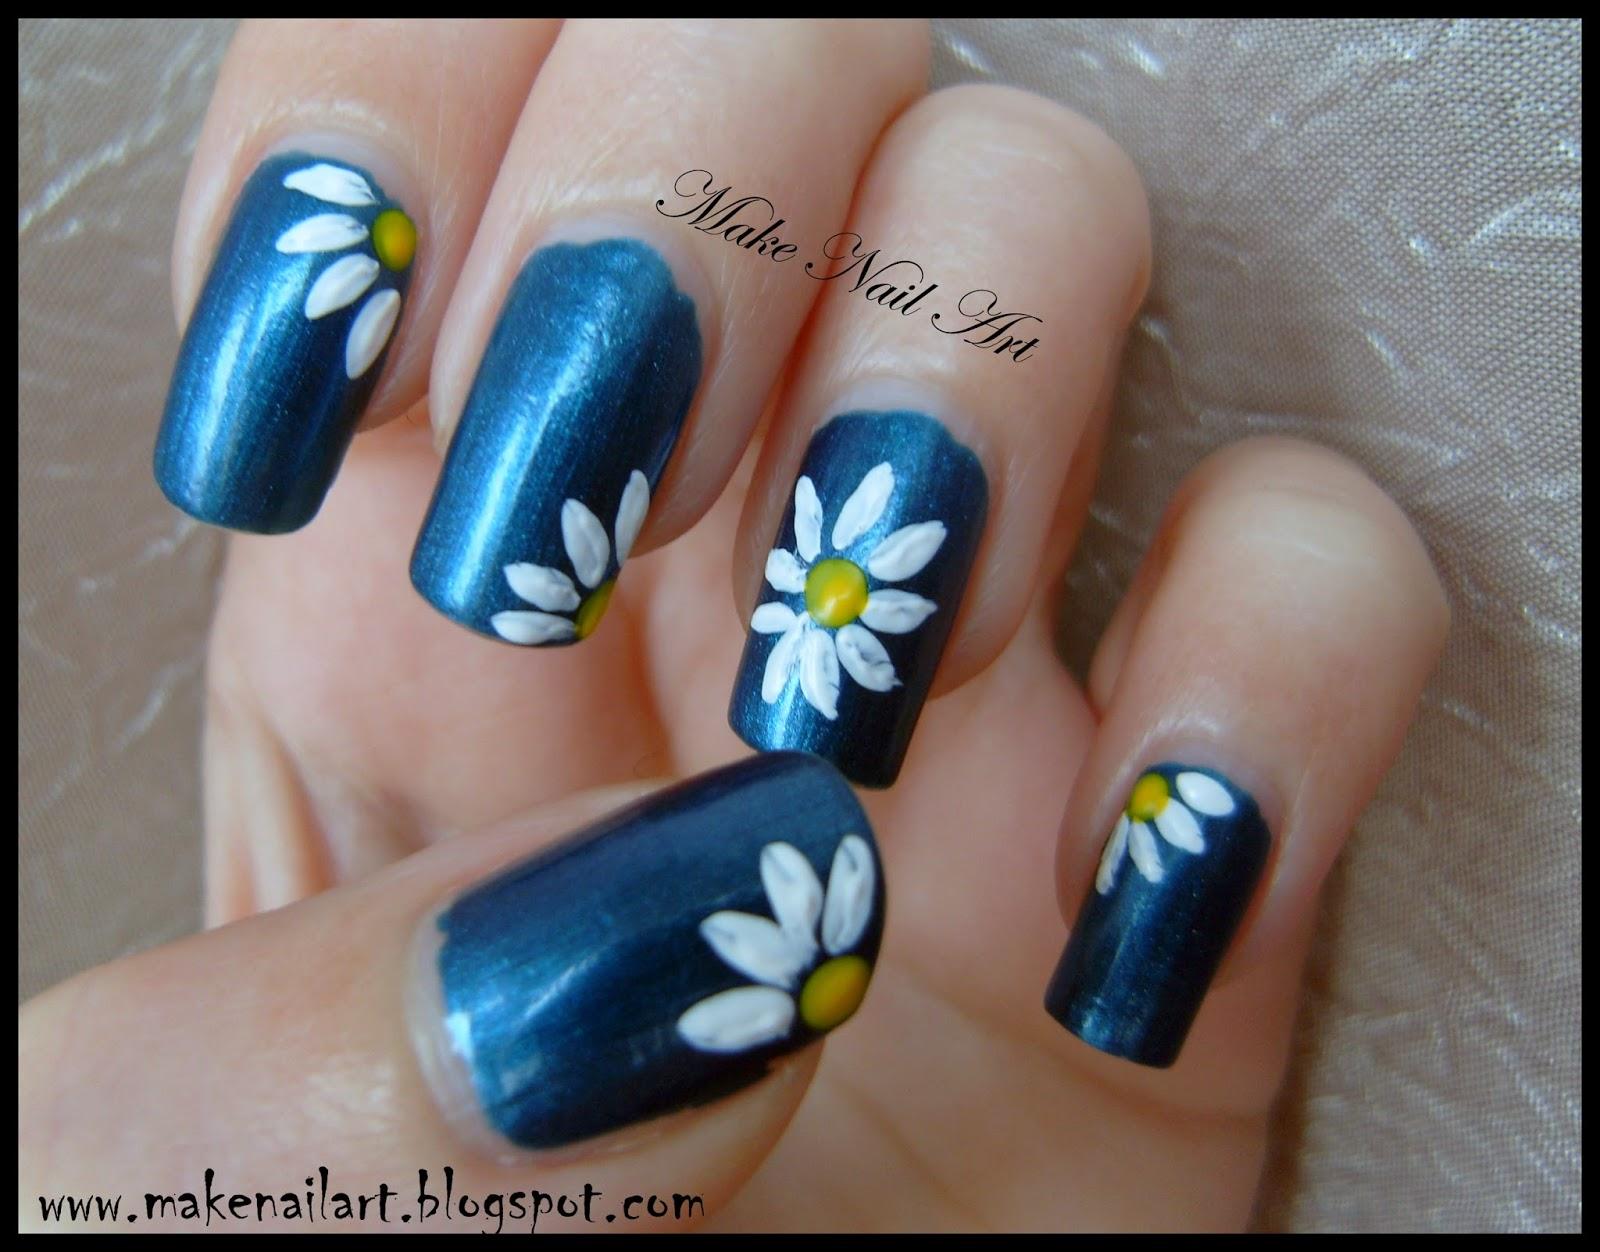 White Daisy Nail Design: Daisy floral nail art.